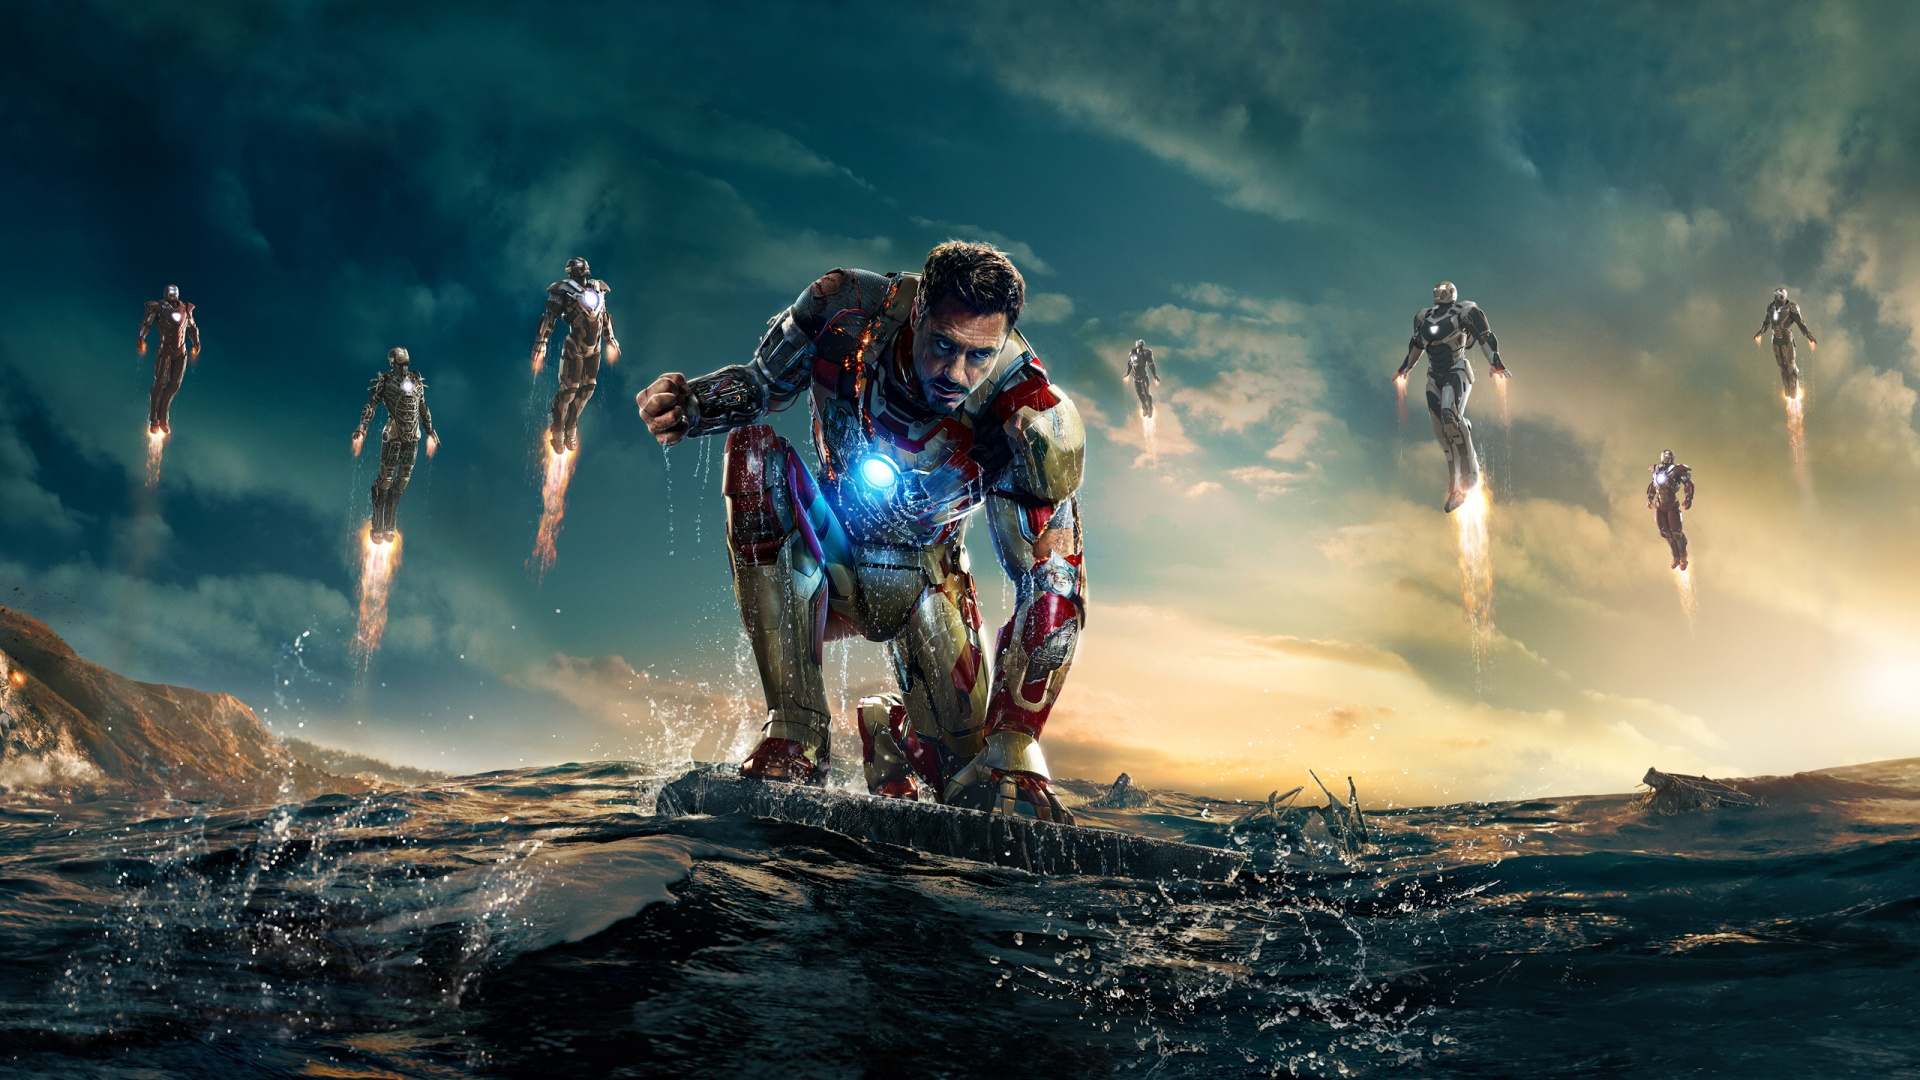 New Iron Man 3 Movie Wallpaper 1920x1080 ImageBankbiz 1920x1080